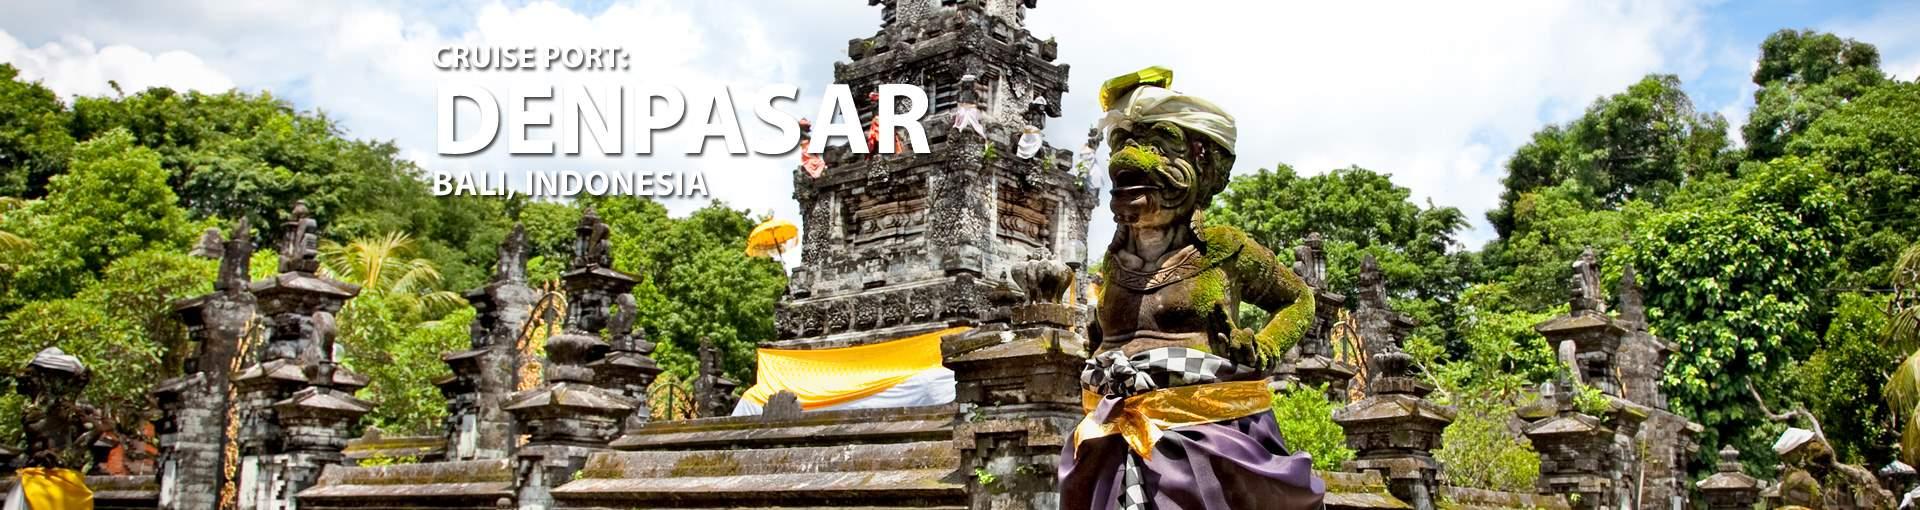 Cruises to Denpasar, Bali, Indonesia